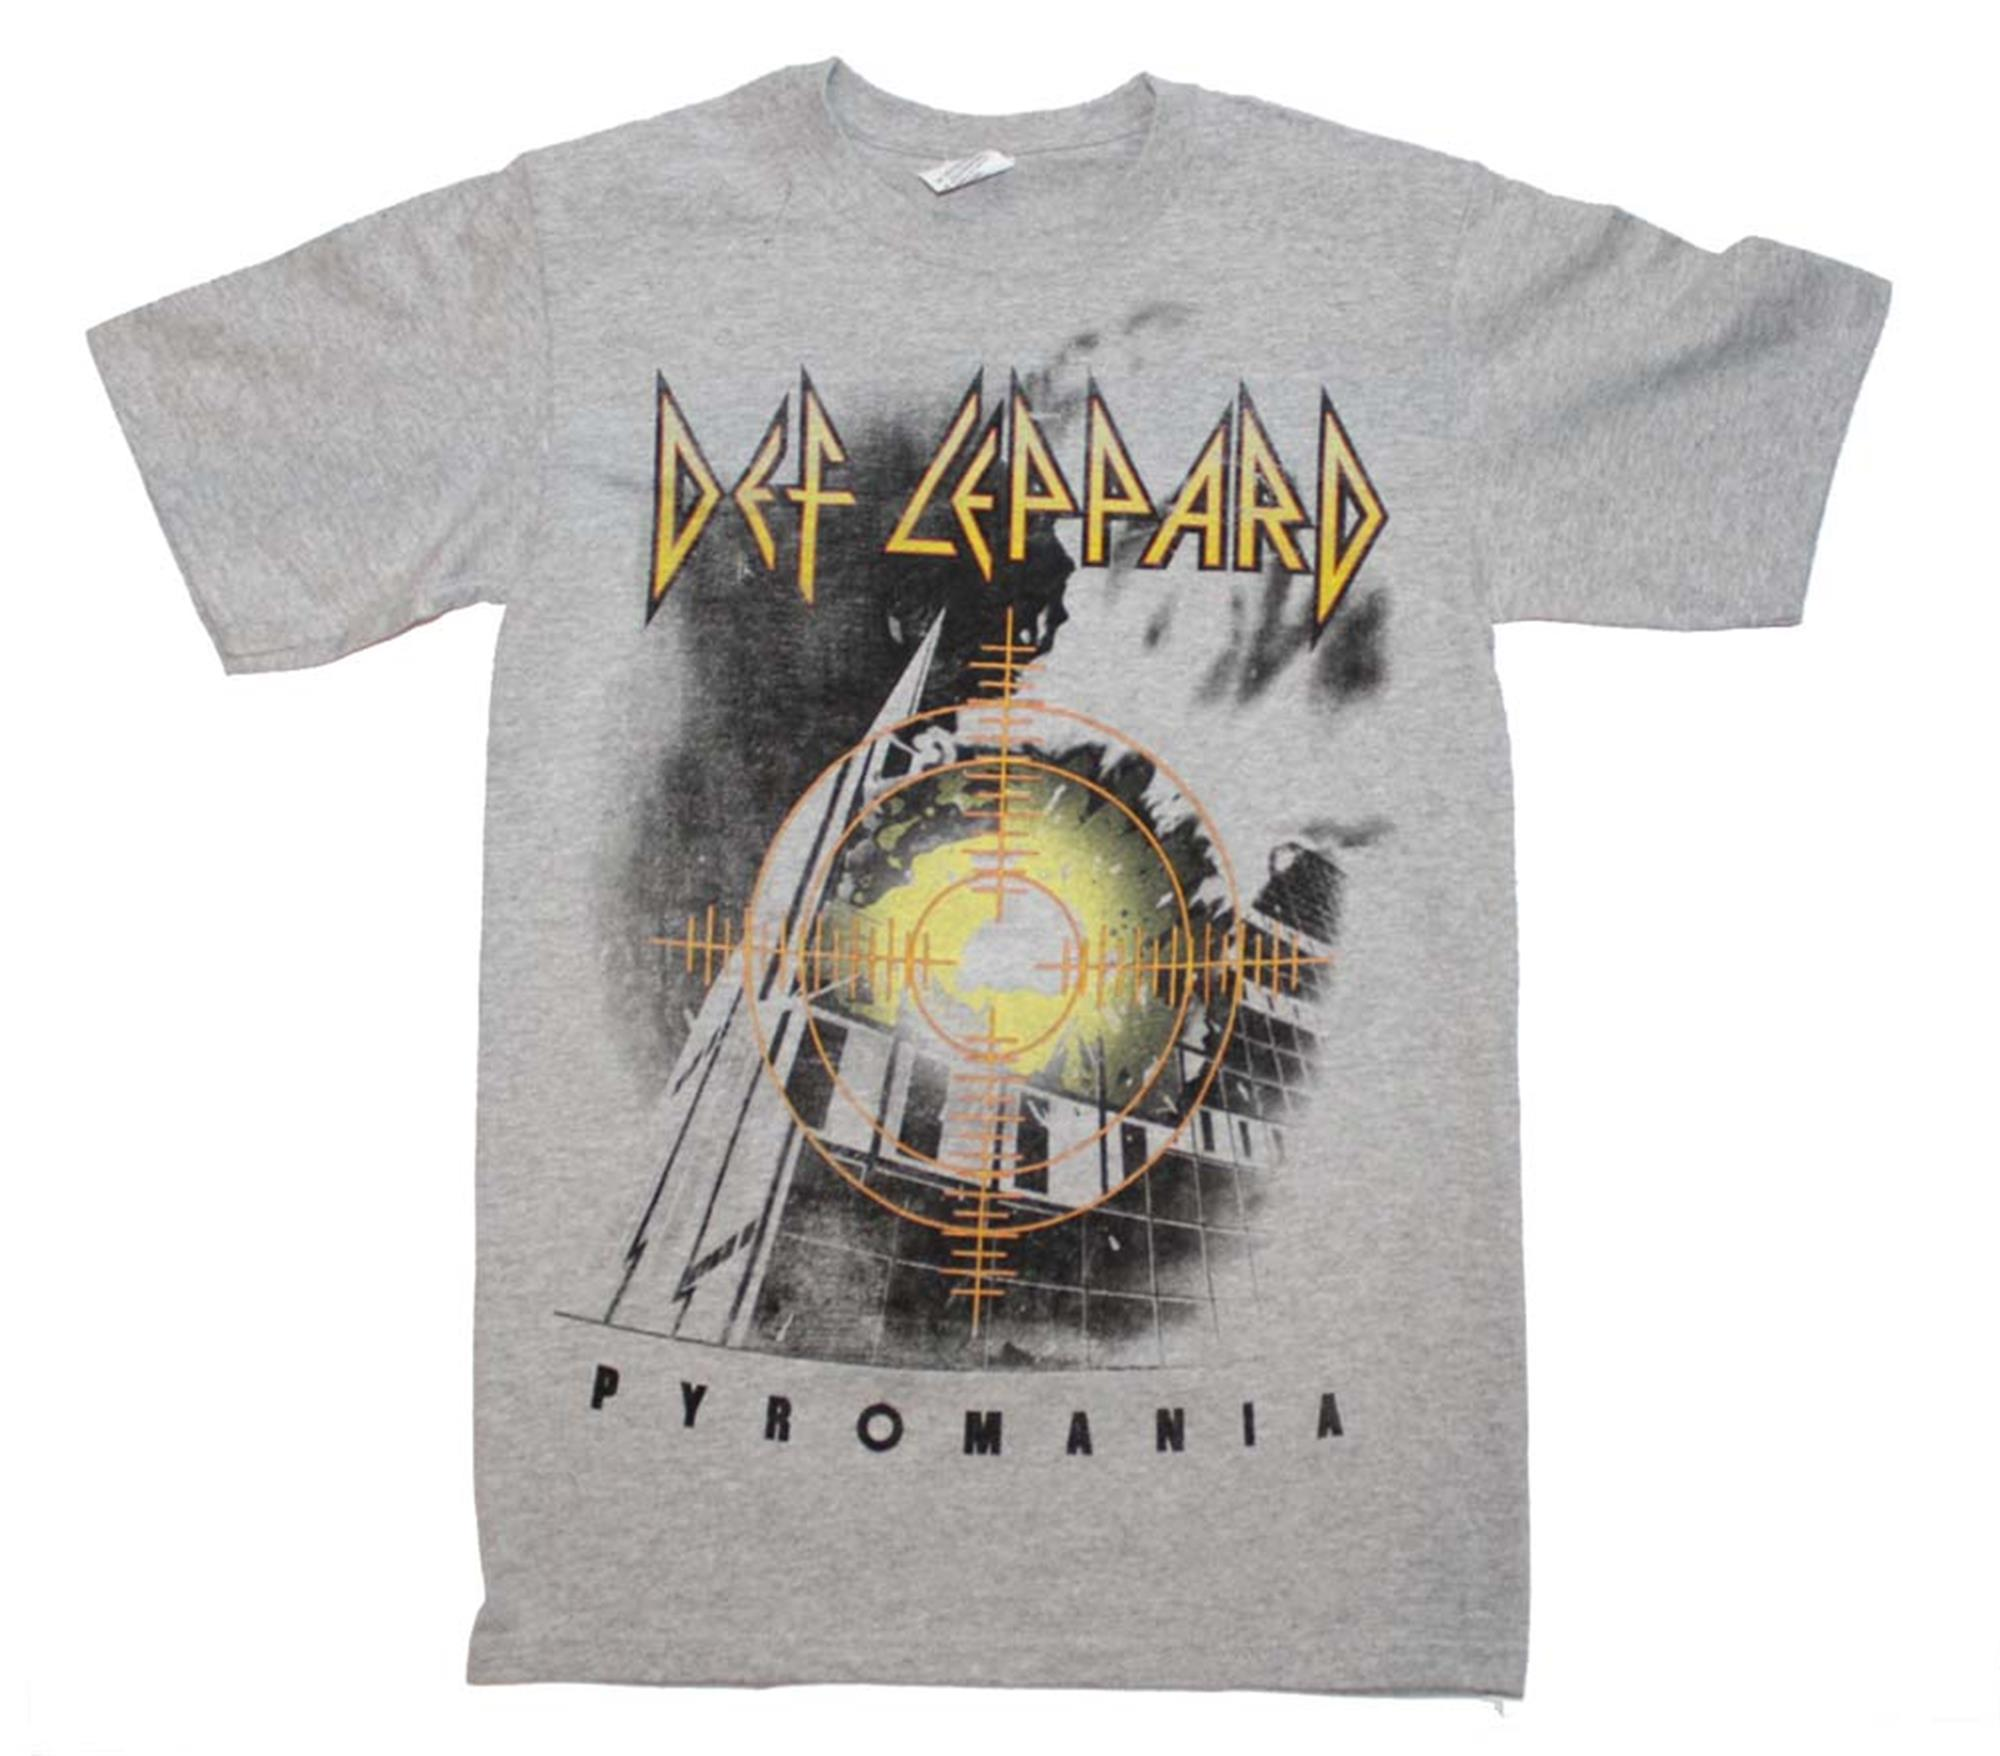 Def Leppard Target Pyromania Heather Gray T-Shirt